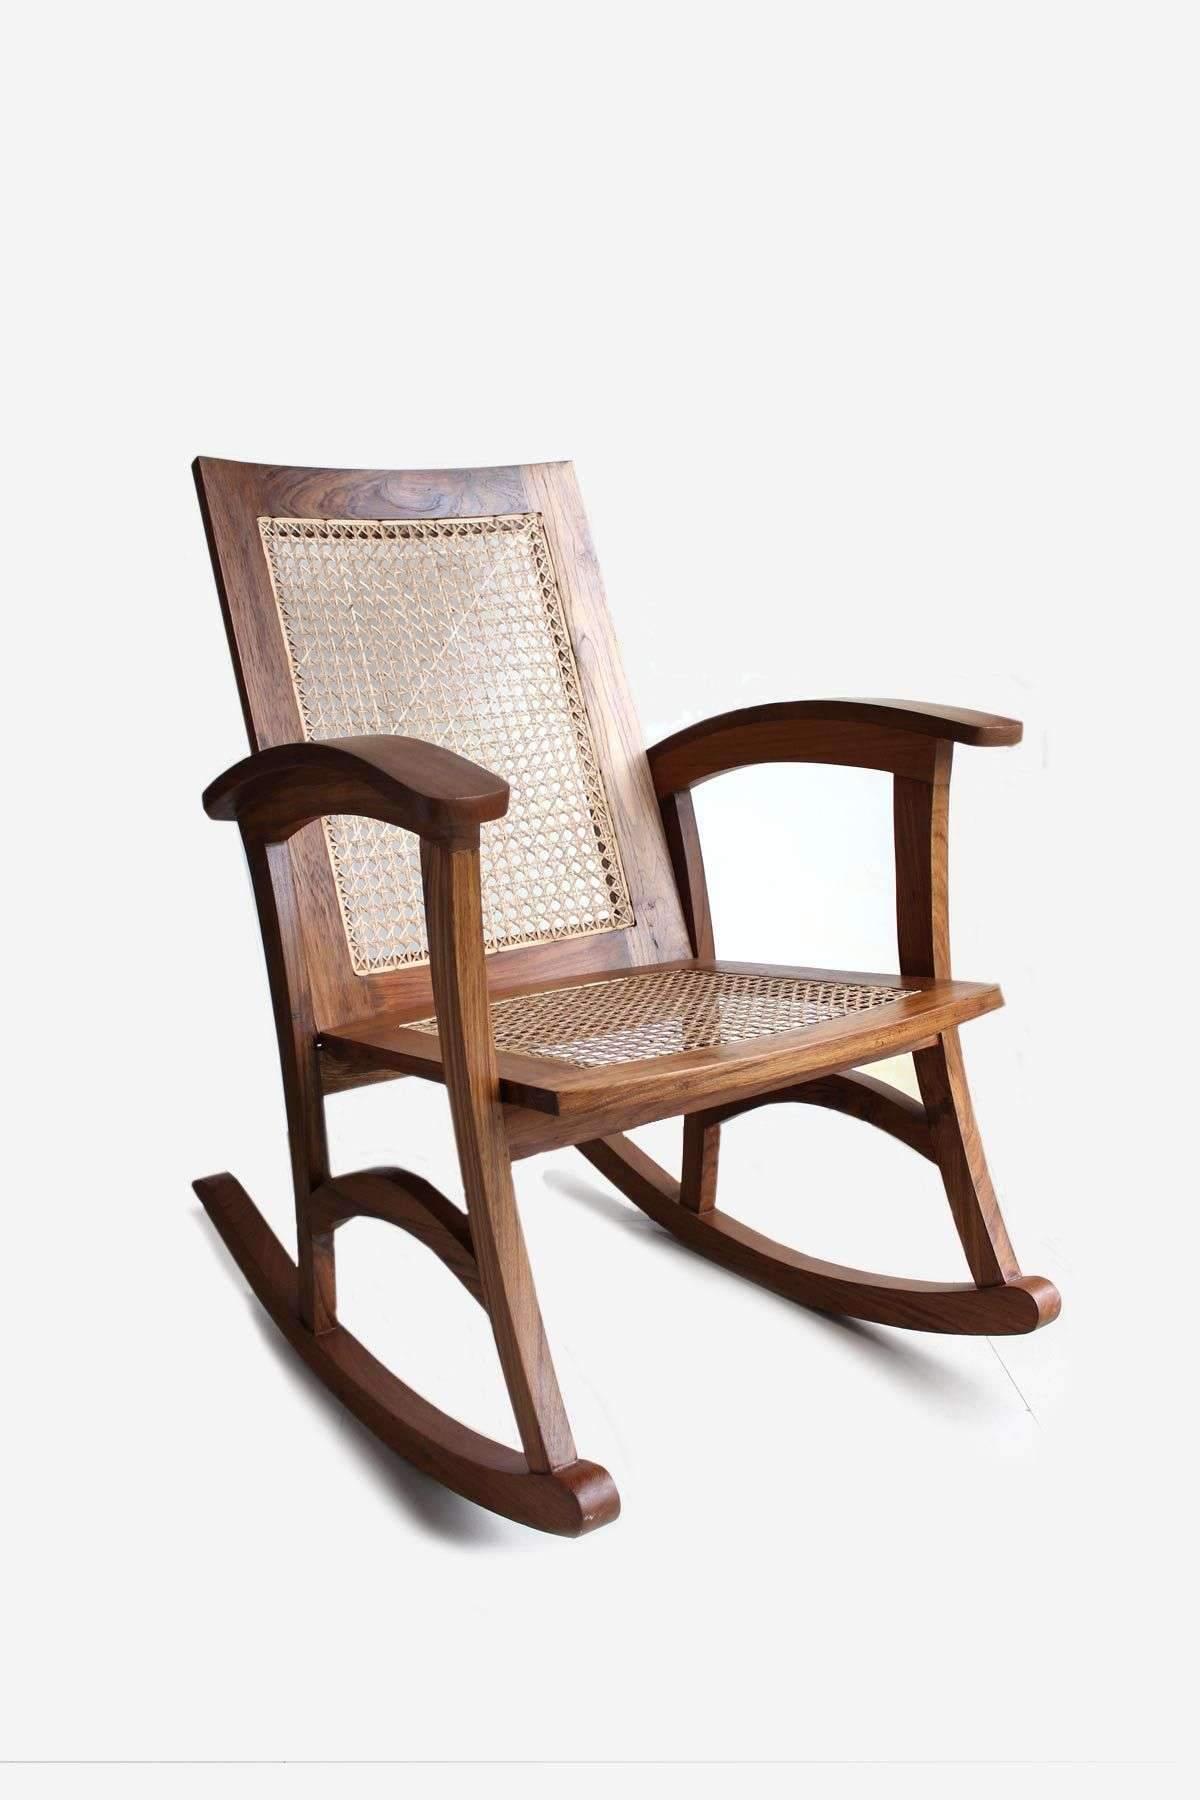 rattan sofa set online india wayfair sleeper reviews buy sets and ottomans freedom tree